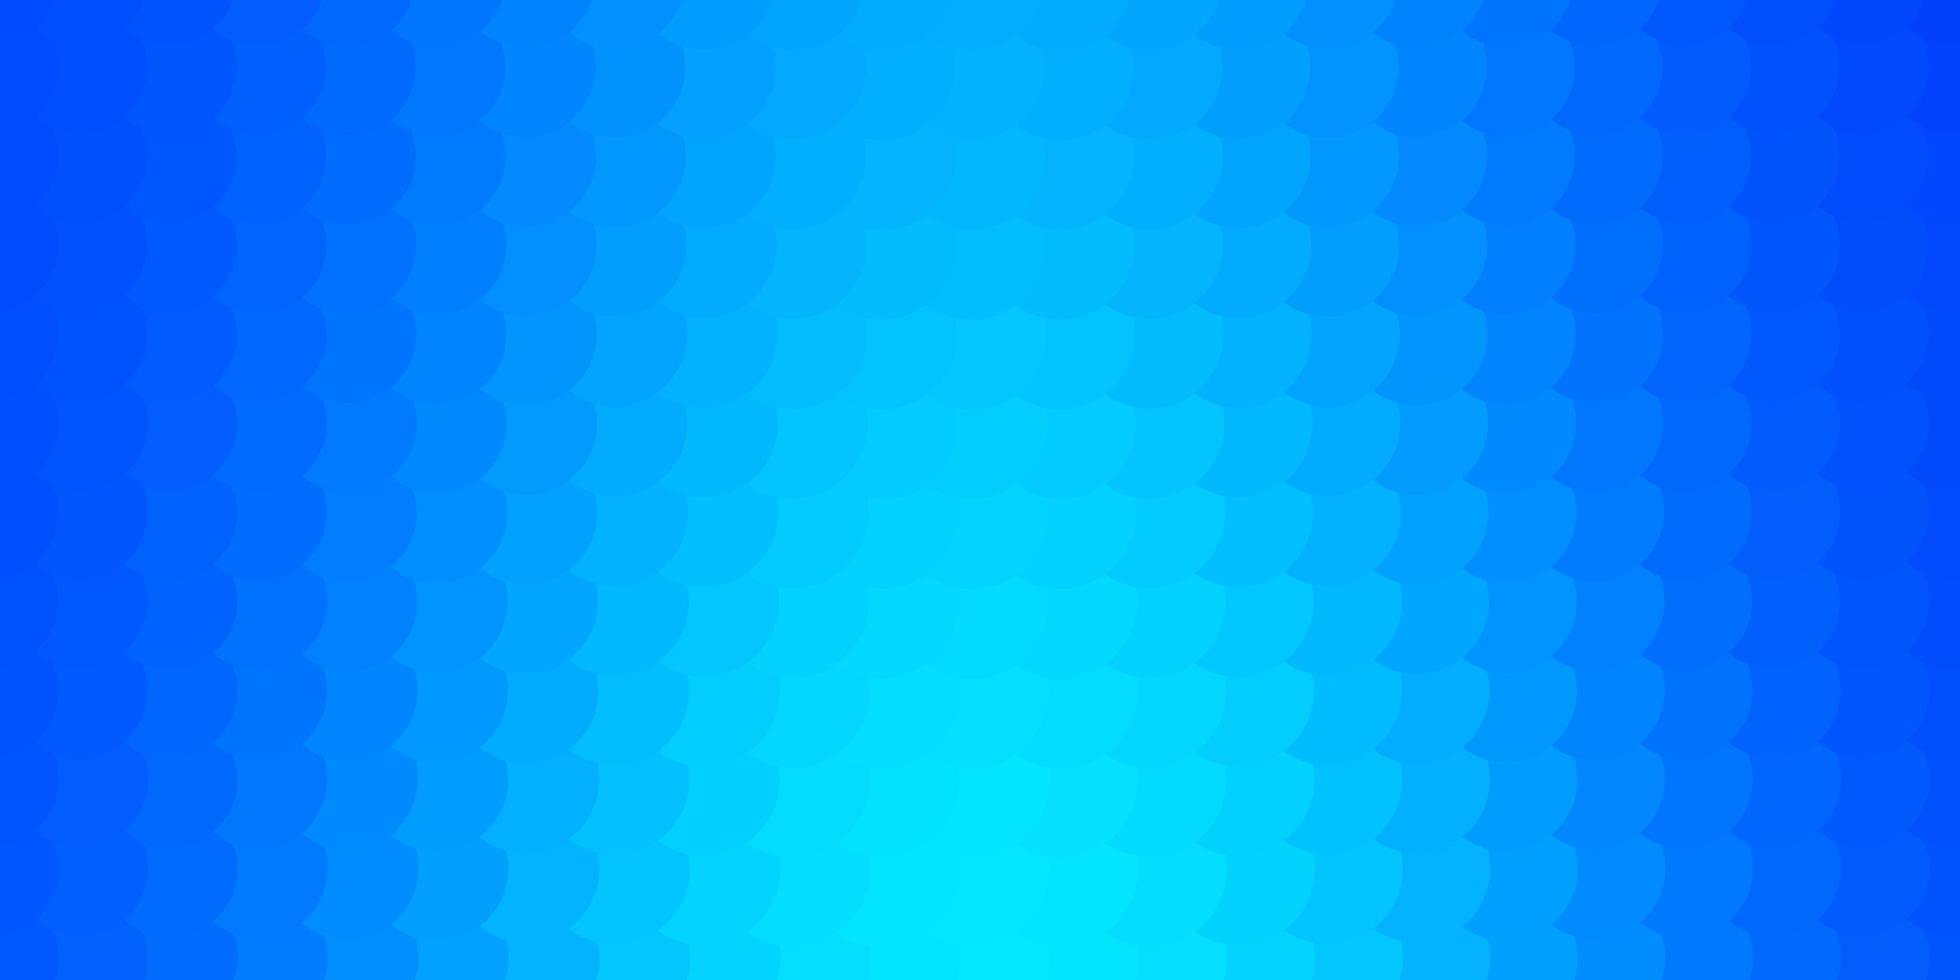 blå bakgrund med bubblor. vektor